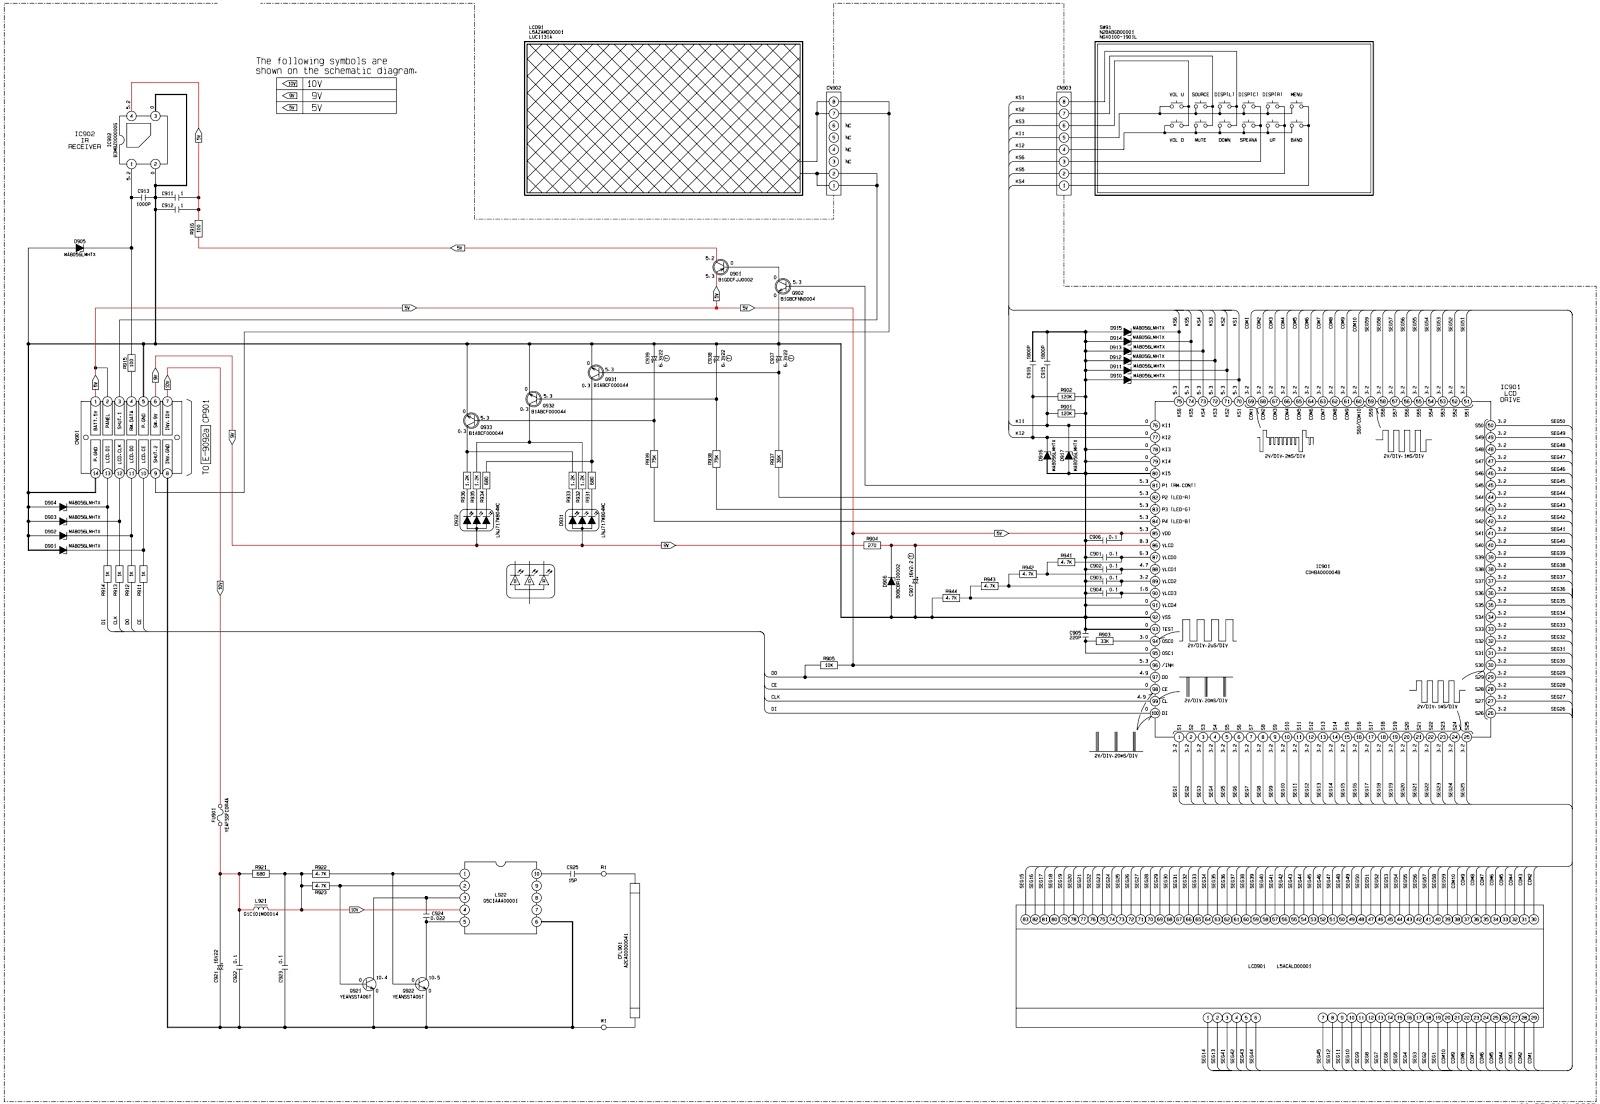 panasonic cq dfx802 schematic diagram schematic diagrams. Black Bedroom Furniture Sets. Home Design Ideas